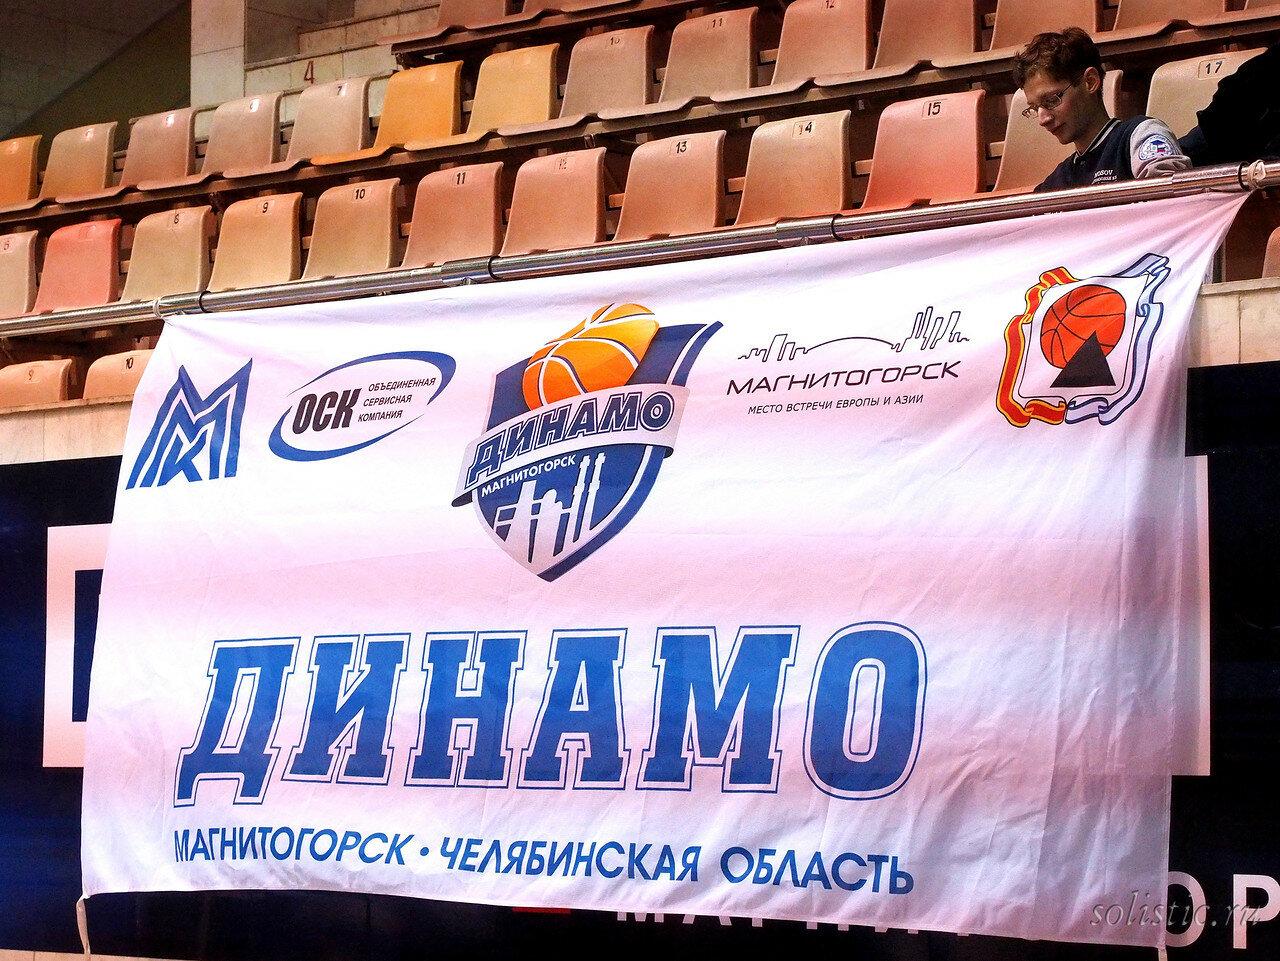 5 Динамо Магнитогорск - Нефтехимик 25.01.2018